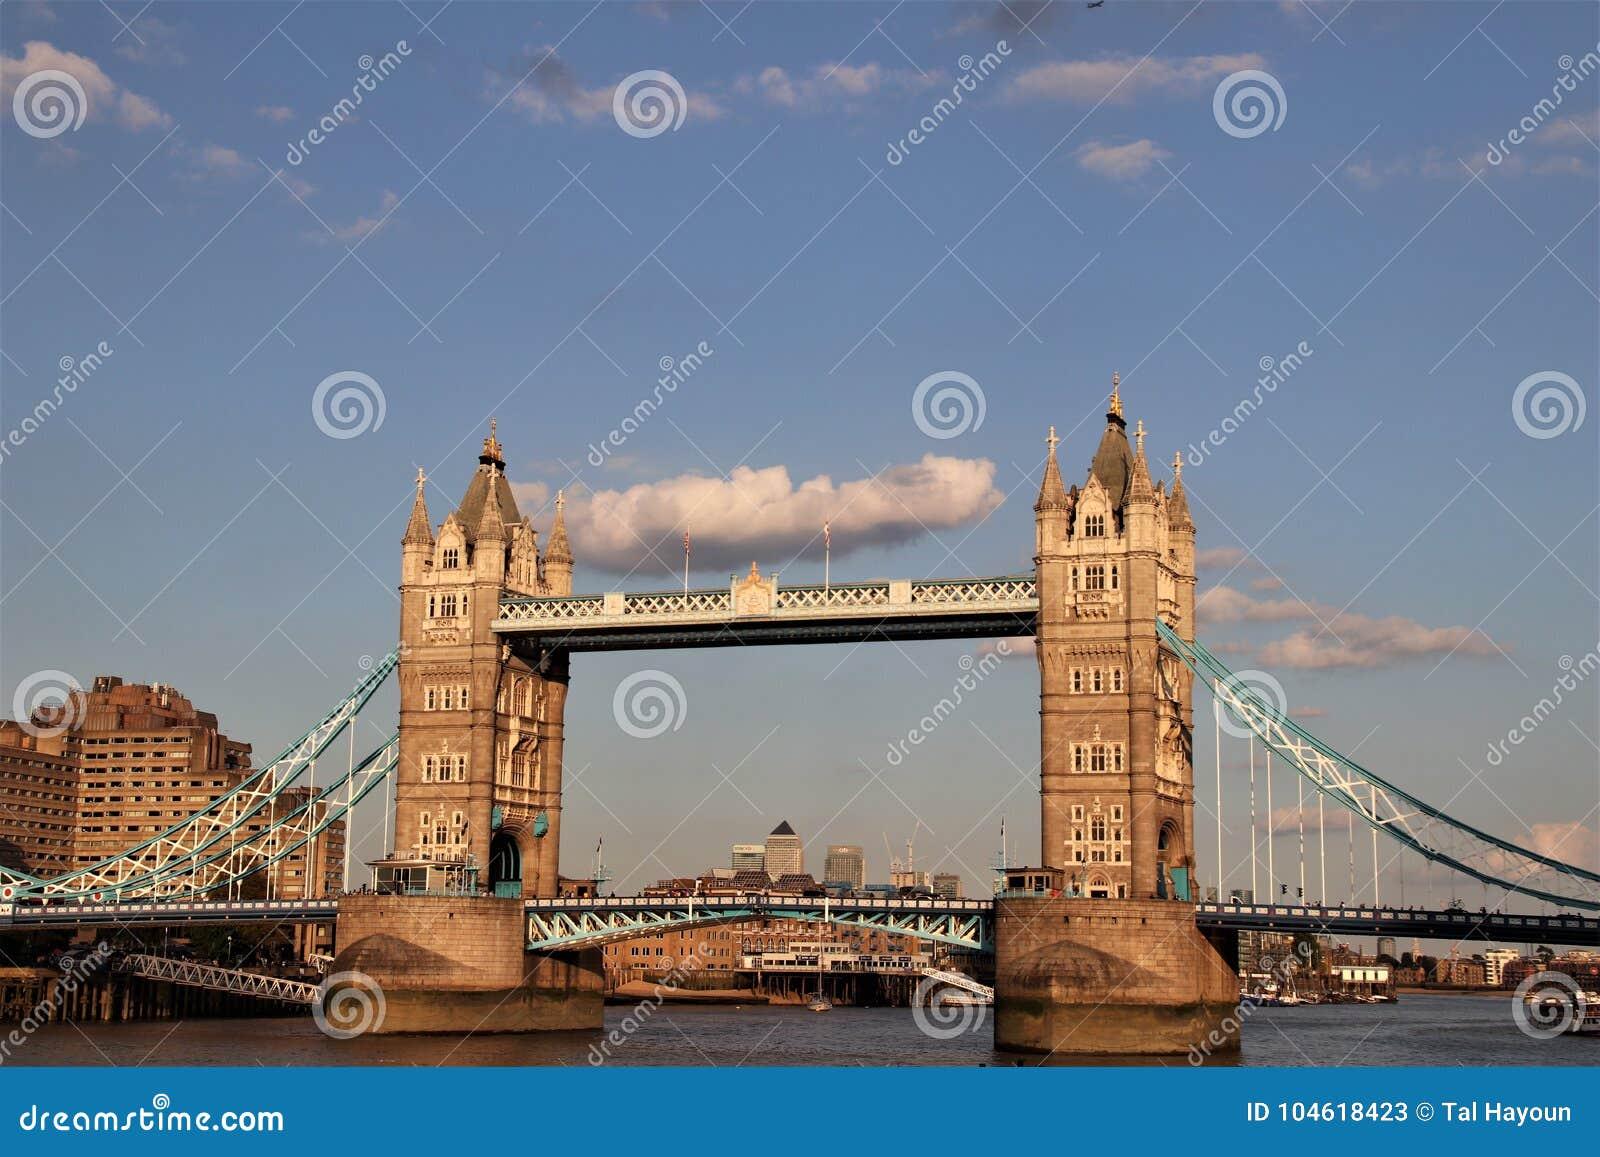 Tower Bridge And River Thames London England